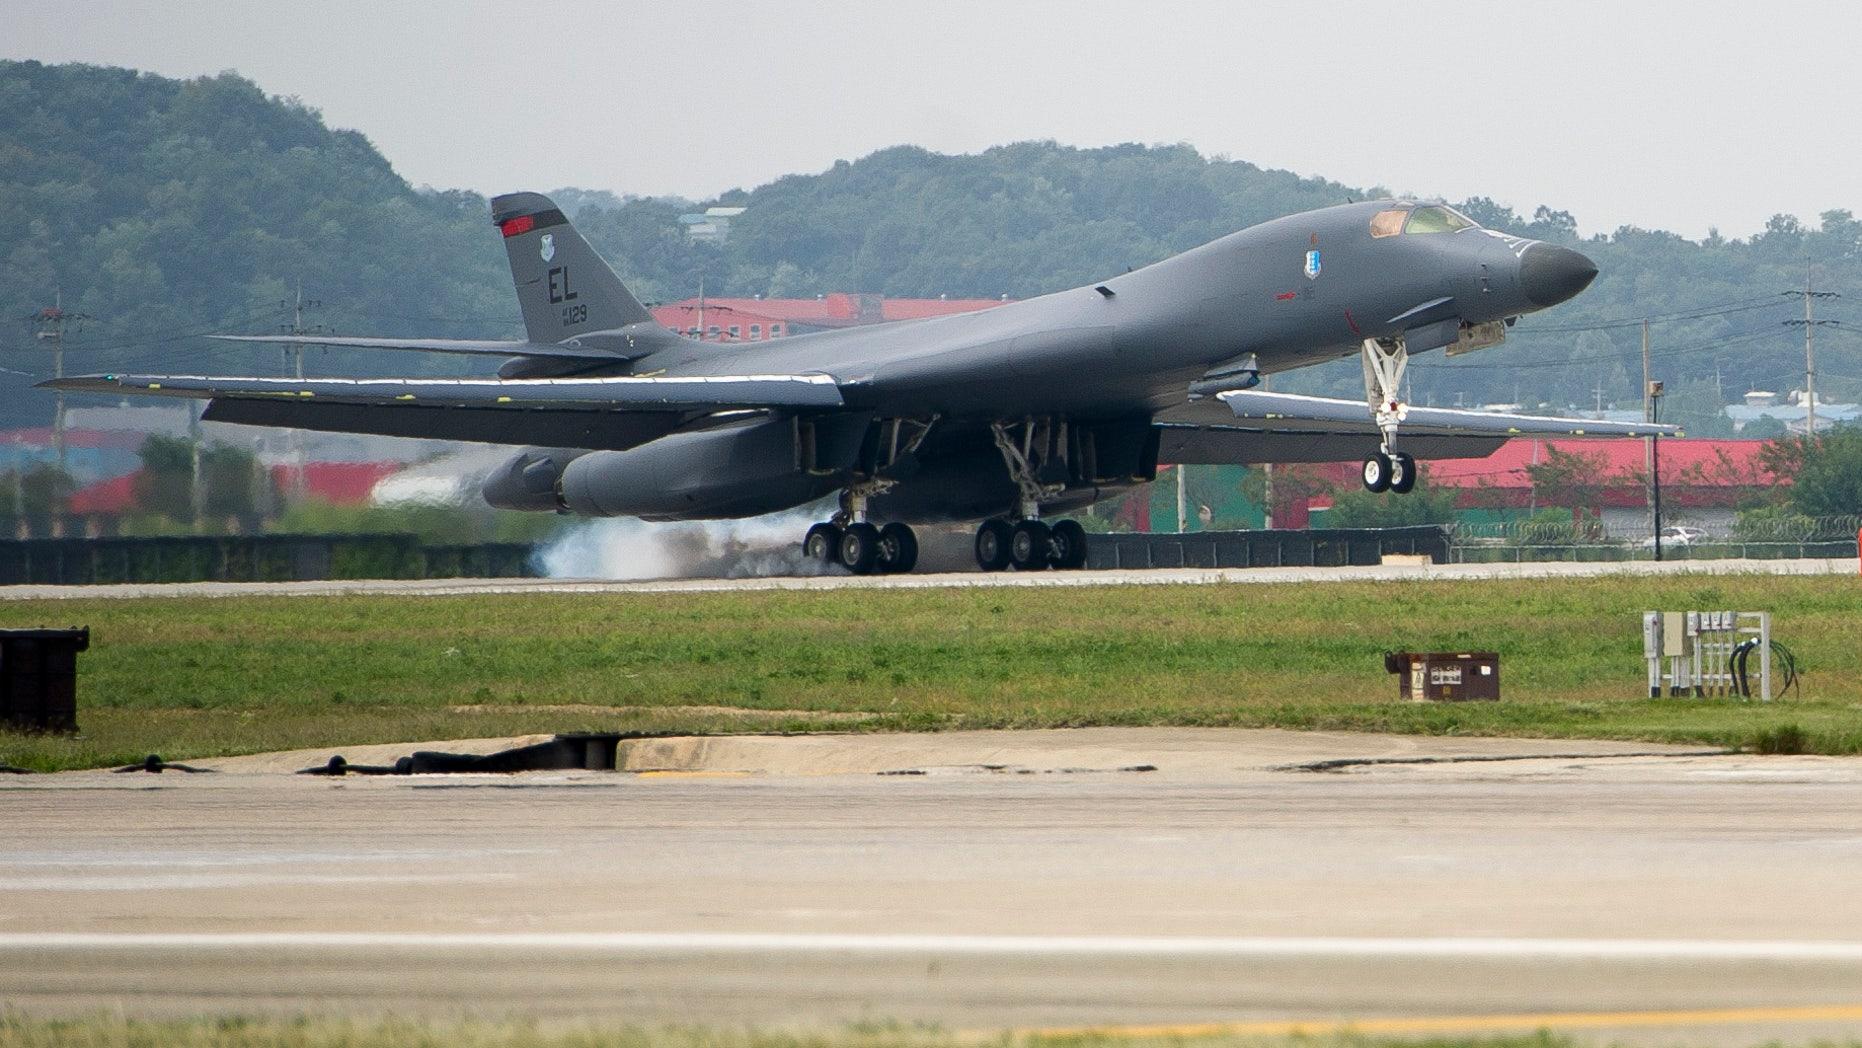 A U.S. Air Force B-1B Lancer landing at Osan Air Base.